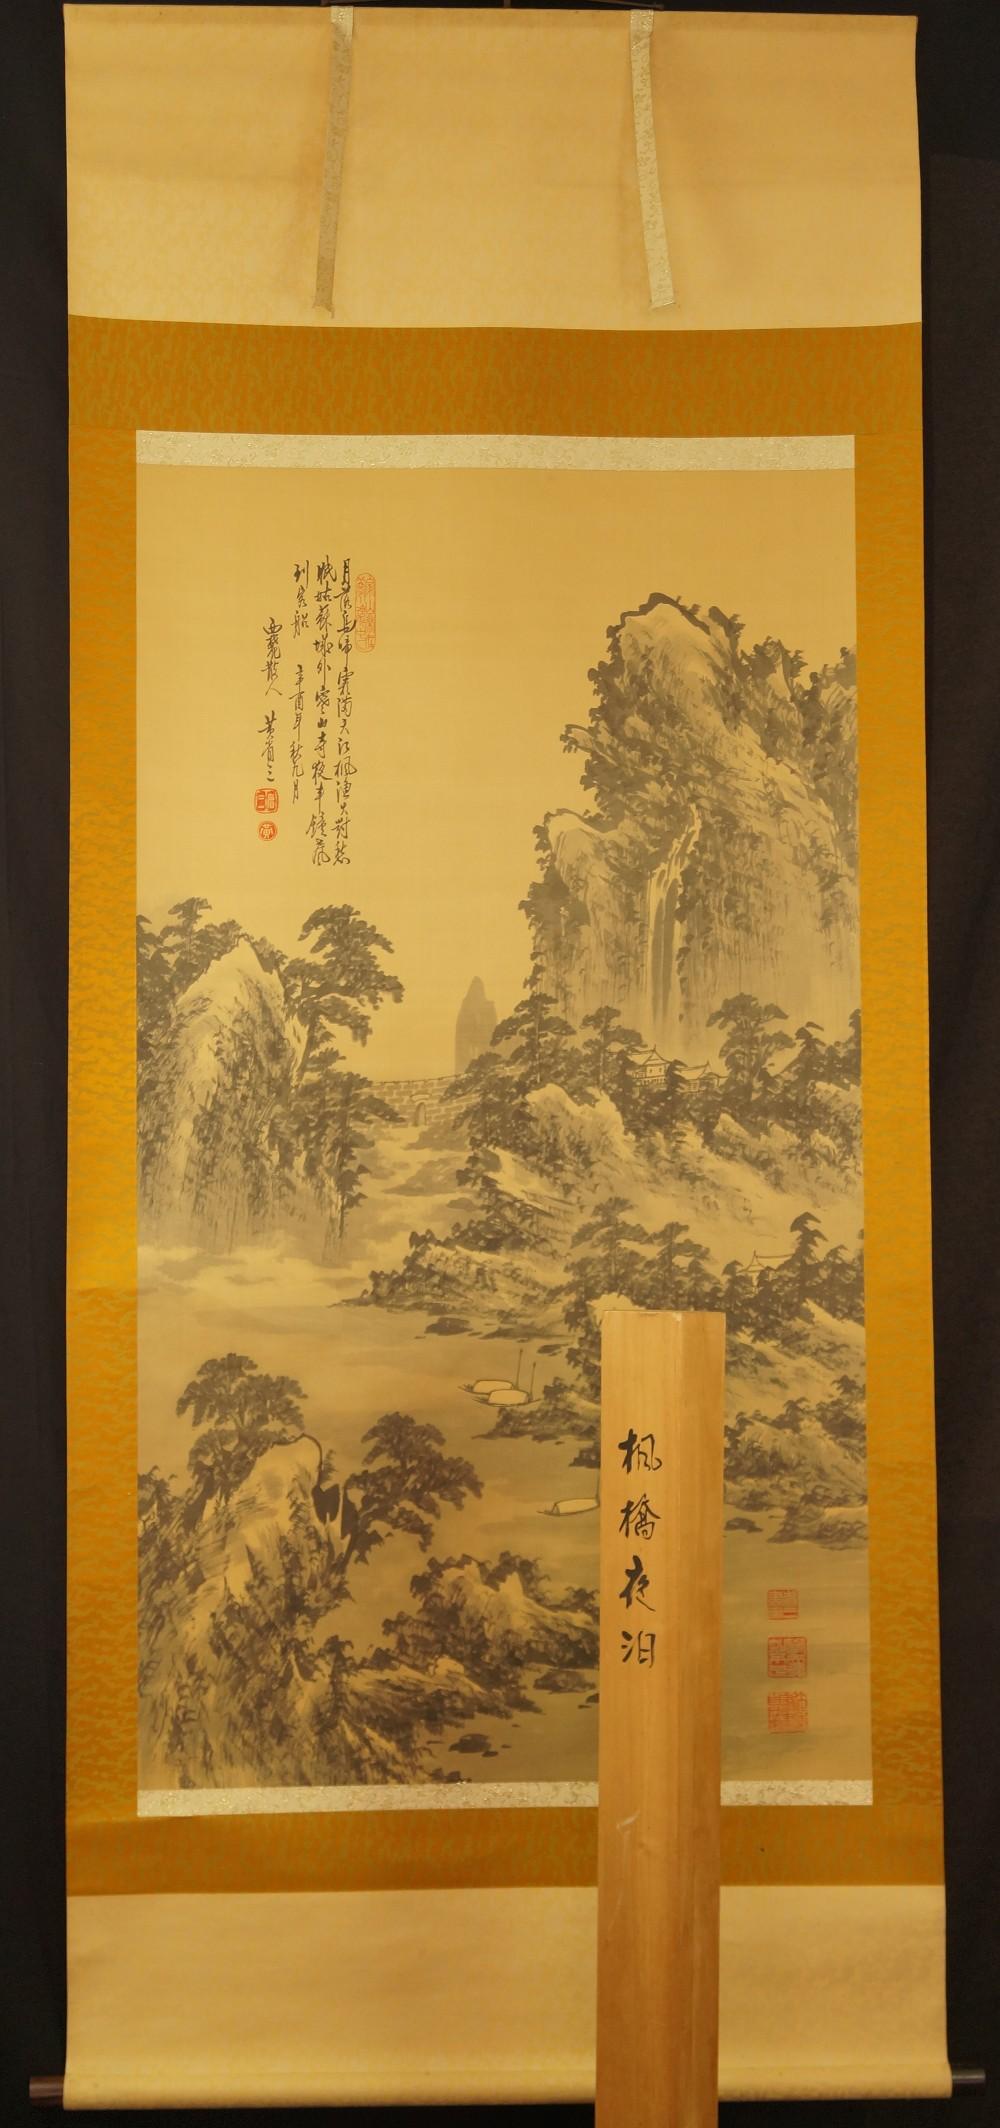 Landschaft - Japanisches Rollbild (Kakejiku, Kakemono) im XXL Format